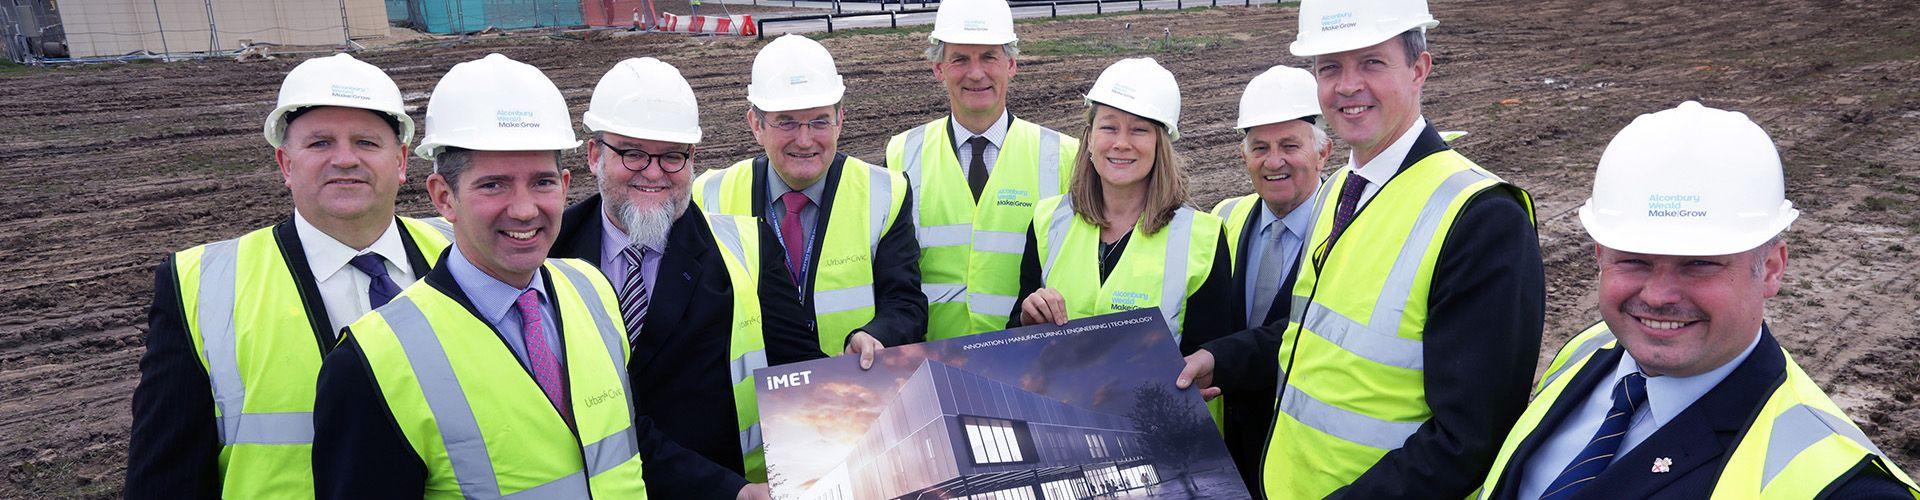 01.04.16_IMET training centre project secures £10.5 million.jpg